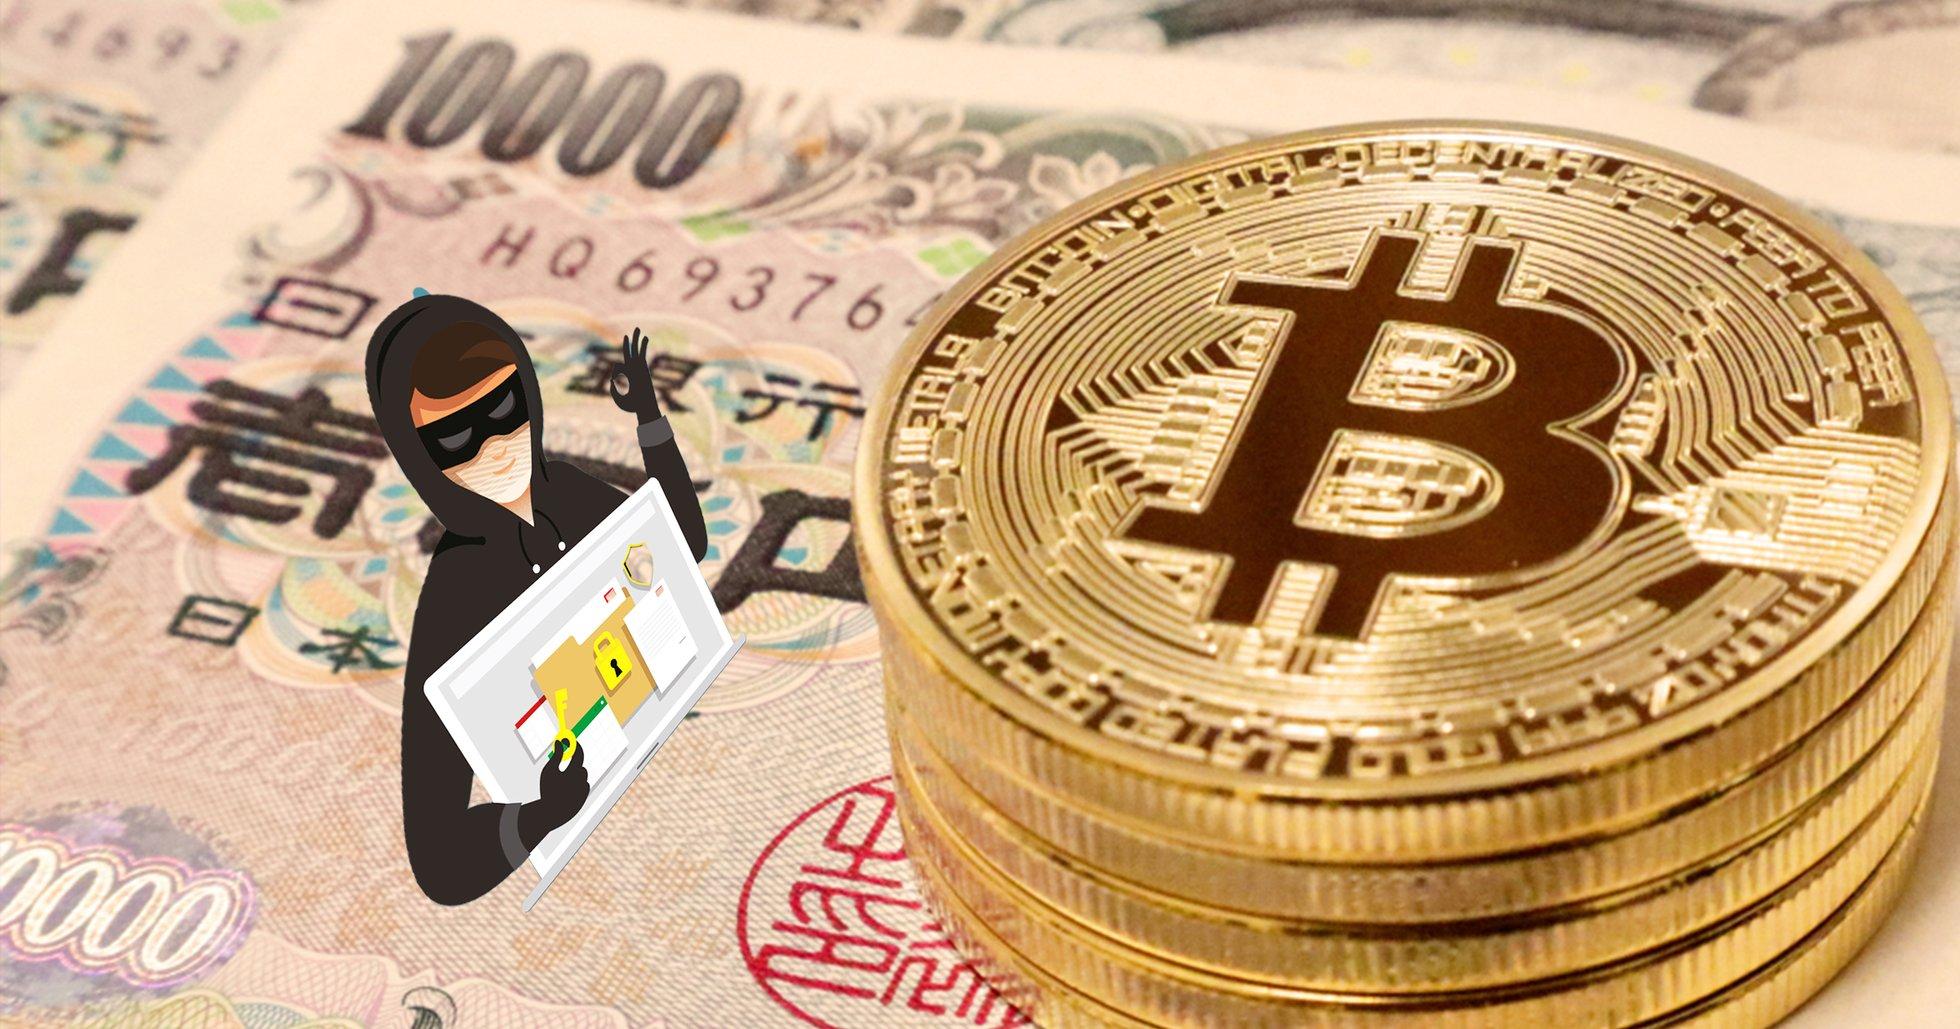 Japanese exchange Bitpoint hacked – $32 million in cryptocurrencies stolen.